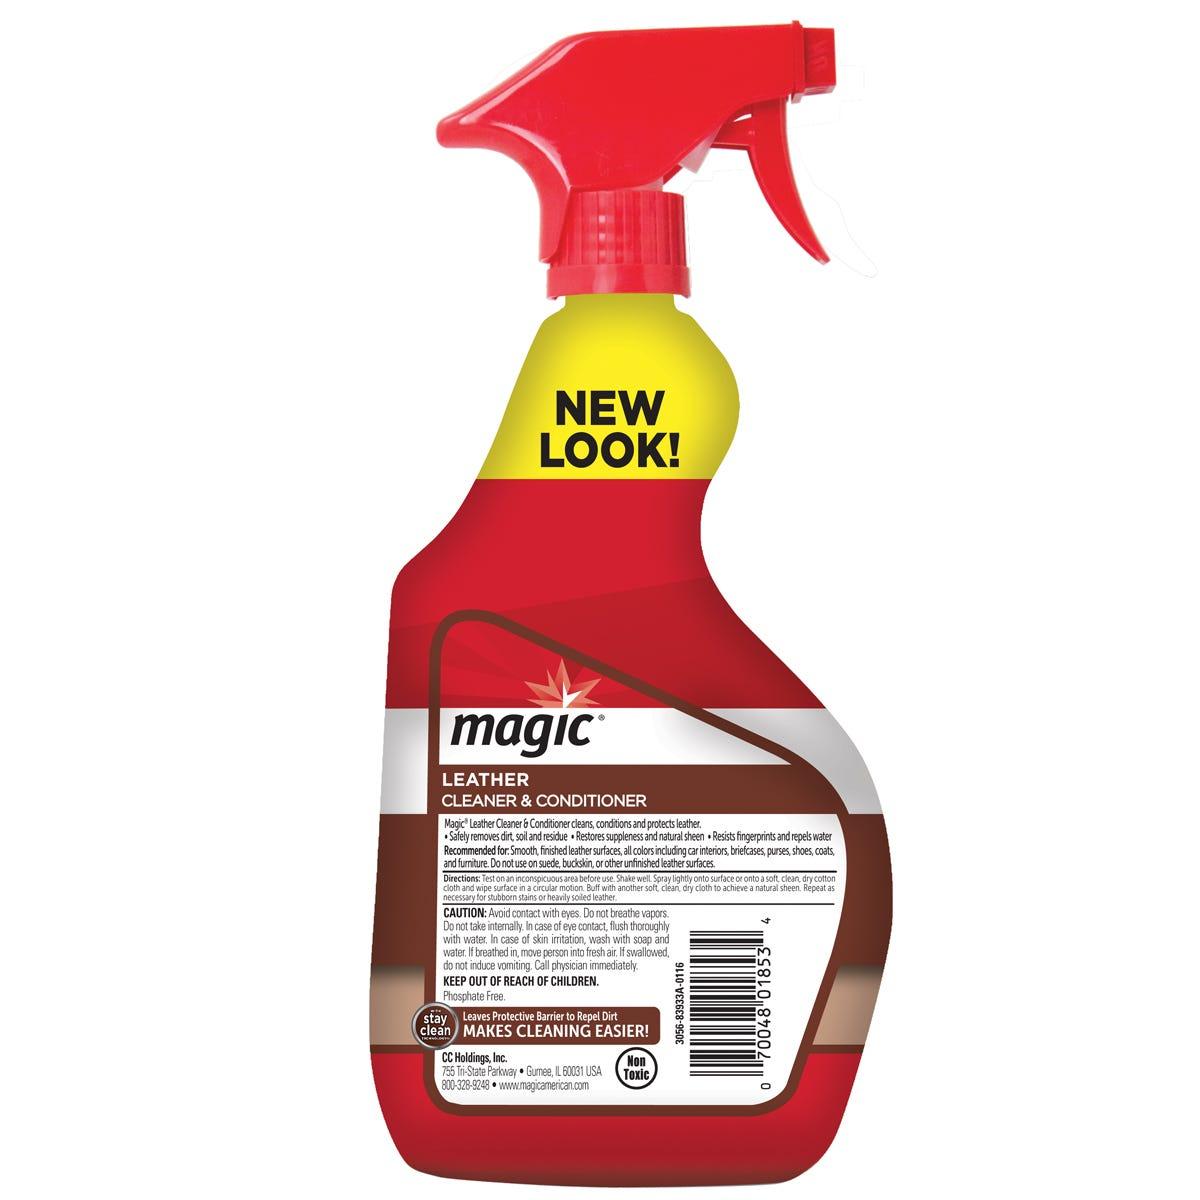 https://googone.com/media/catalog/product/m/a/magic-leather-cleaner-spray_back.jpg